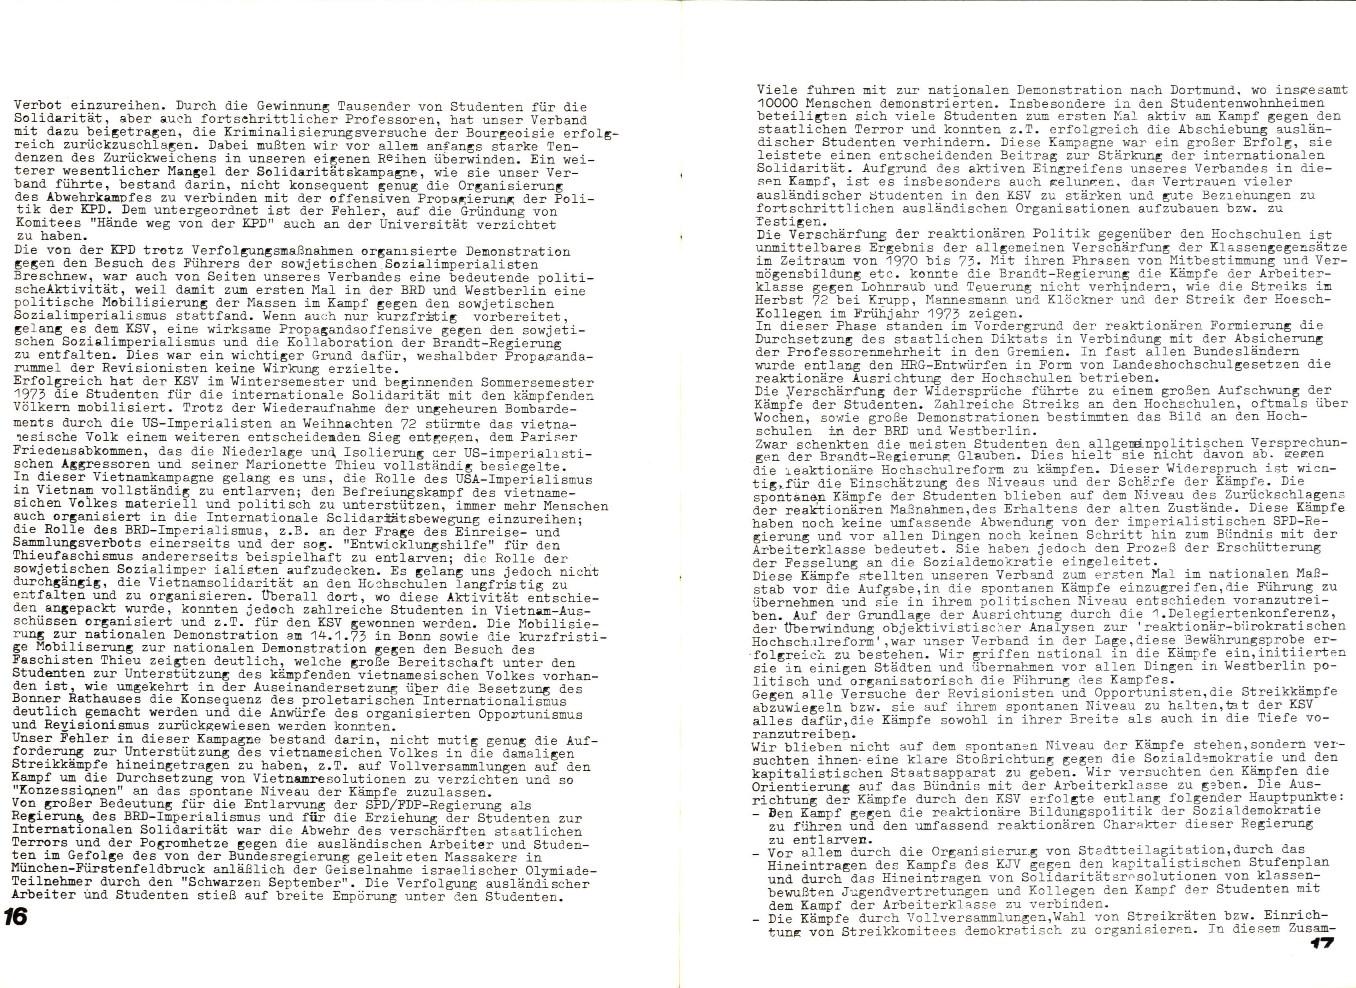 KSV_1974_Rechenschaftsbericht_10